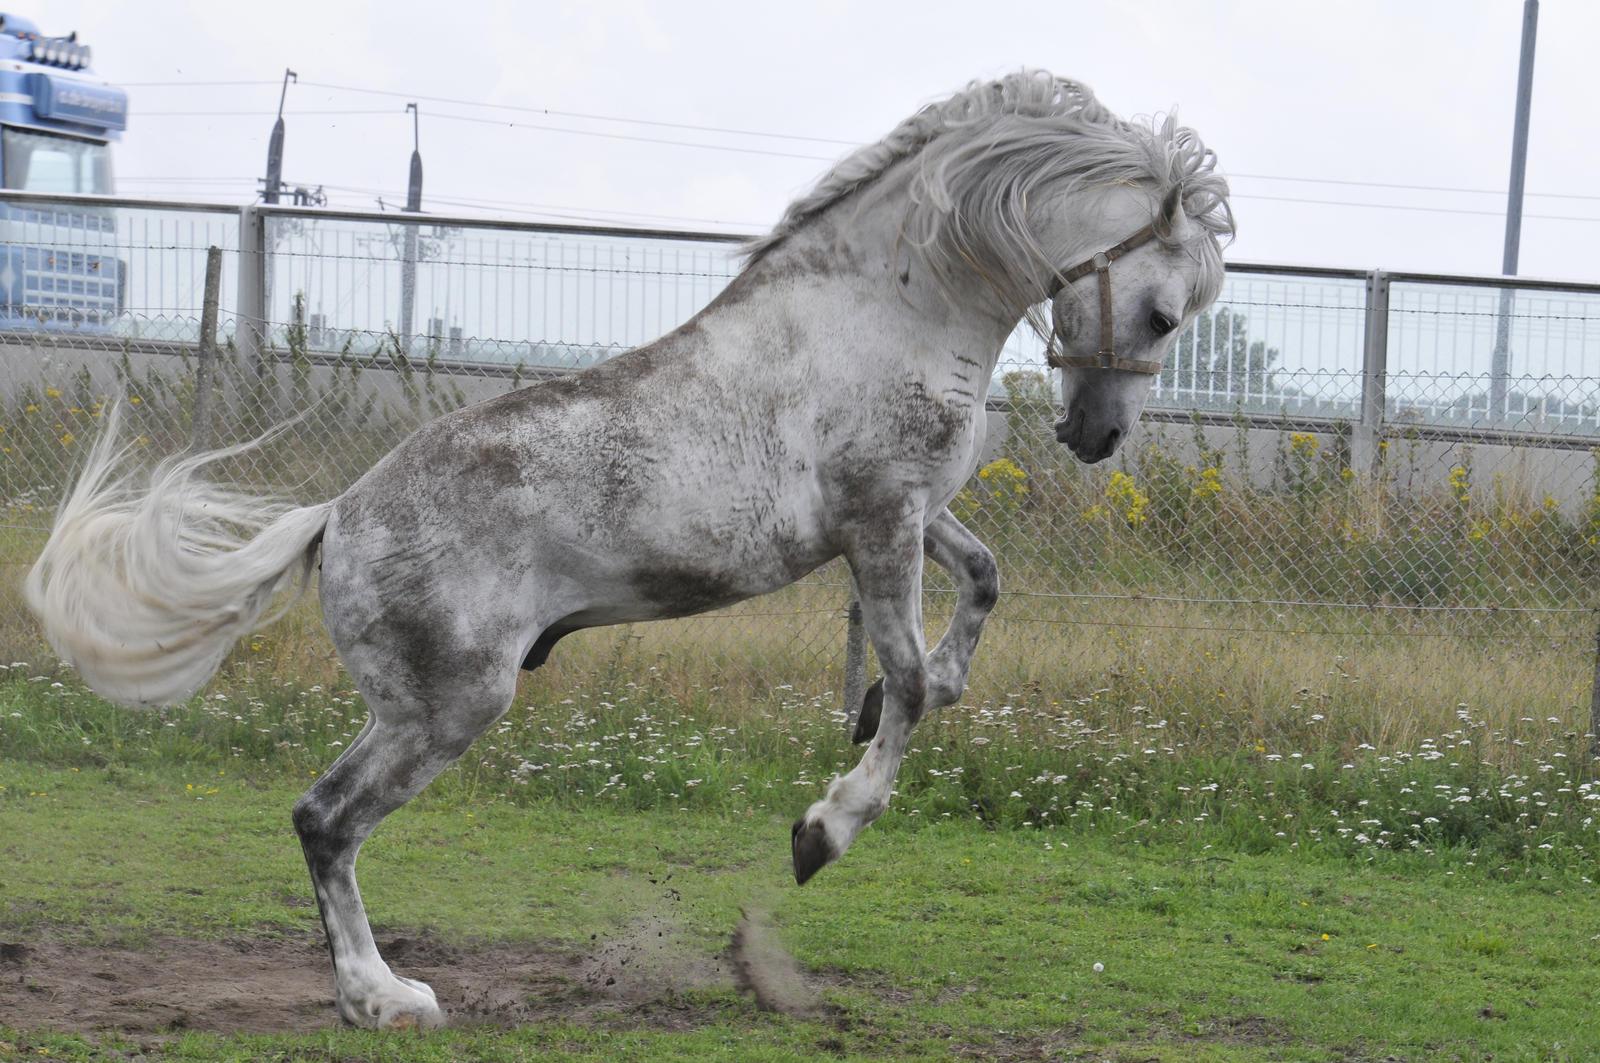 Horse fun by Megan1970